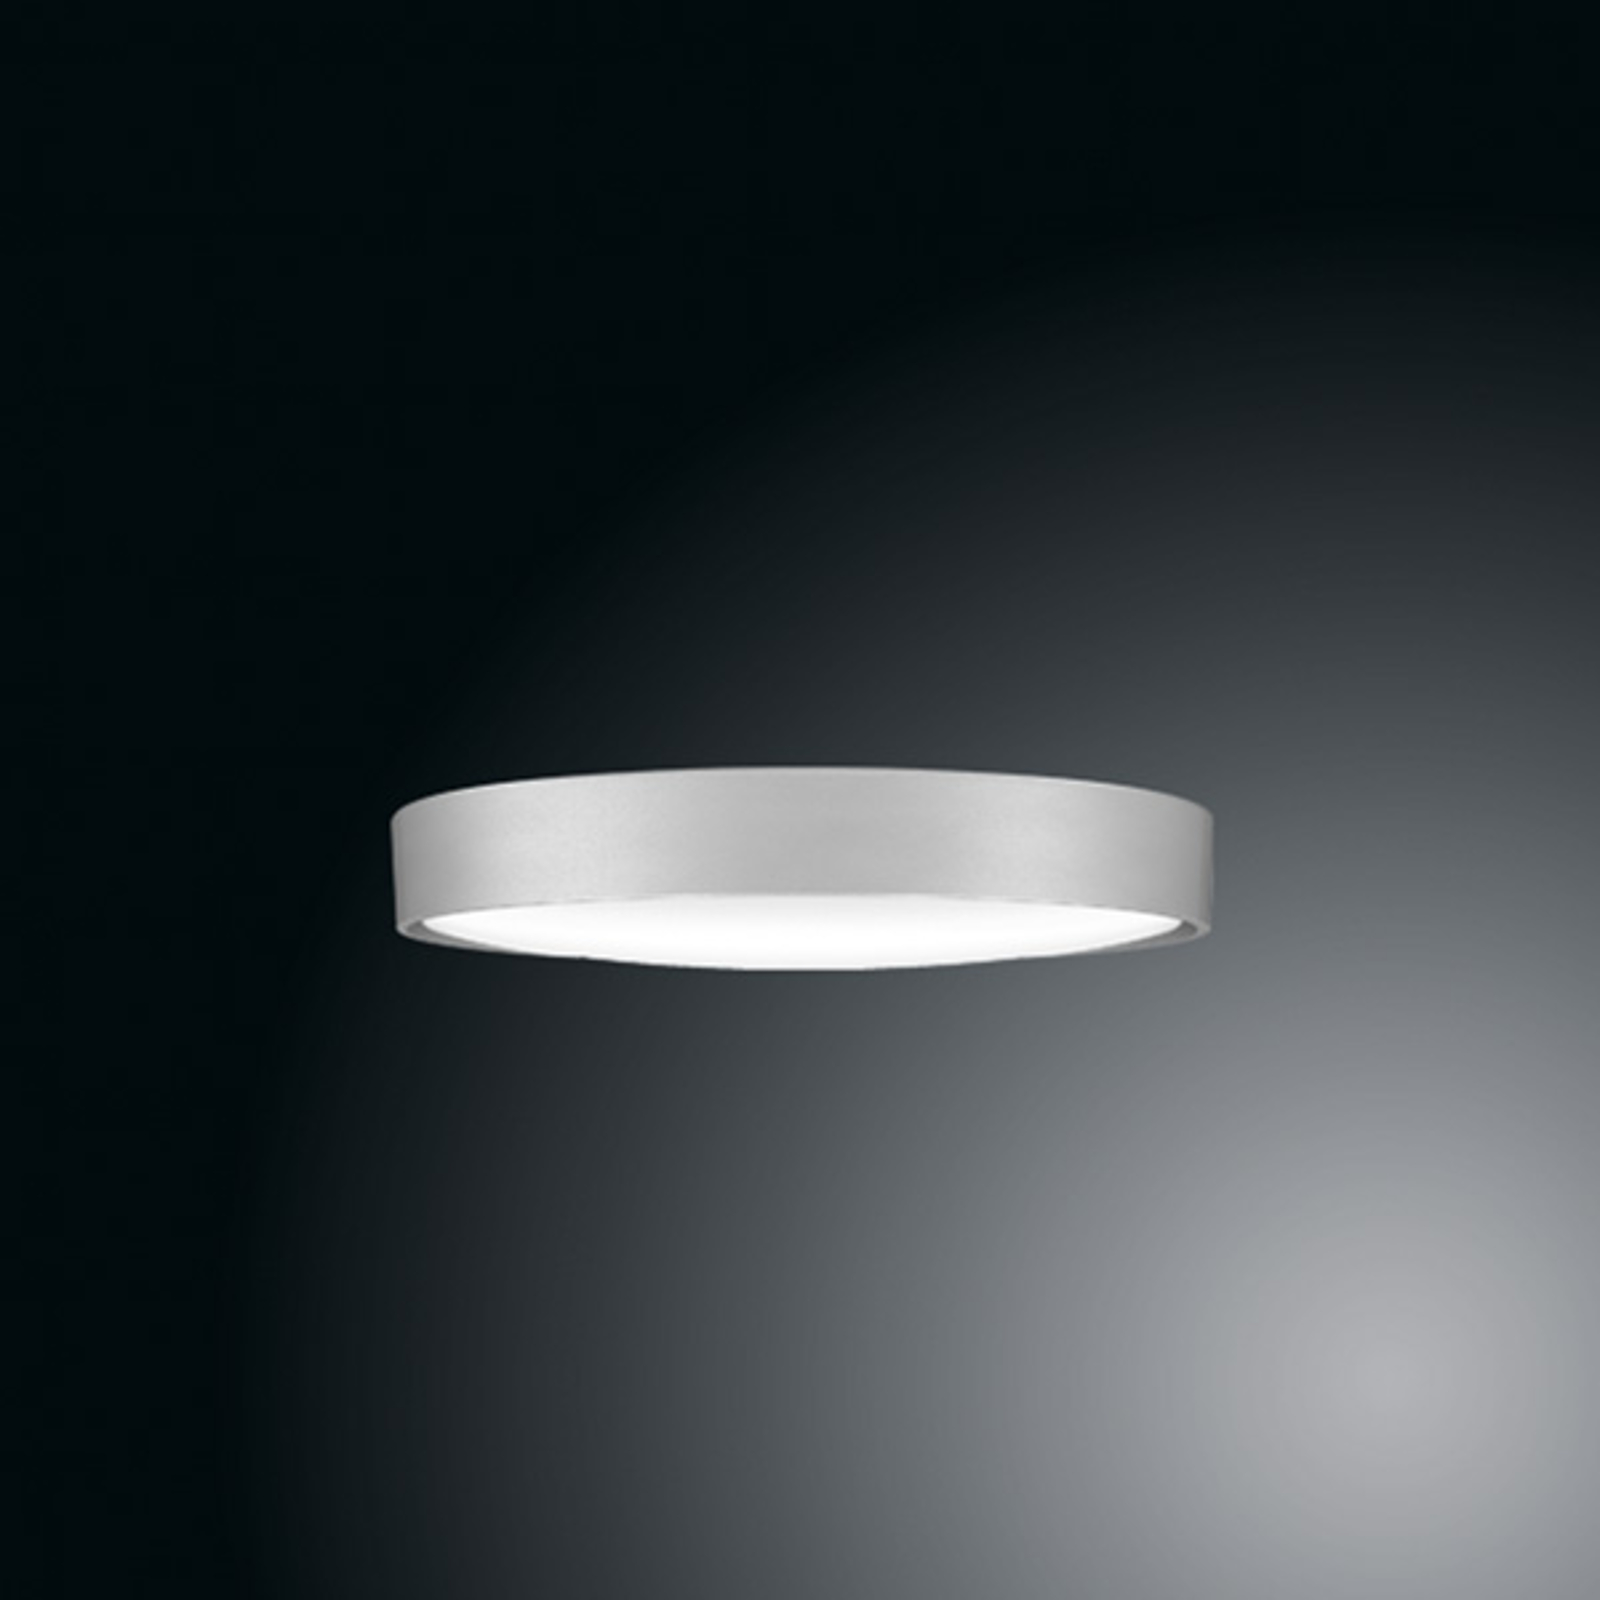 Ribag Arva LED-Deckenlampe, grau metallic, 27 cm